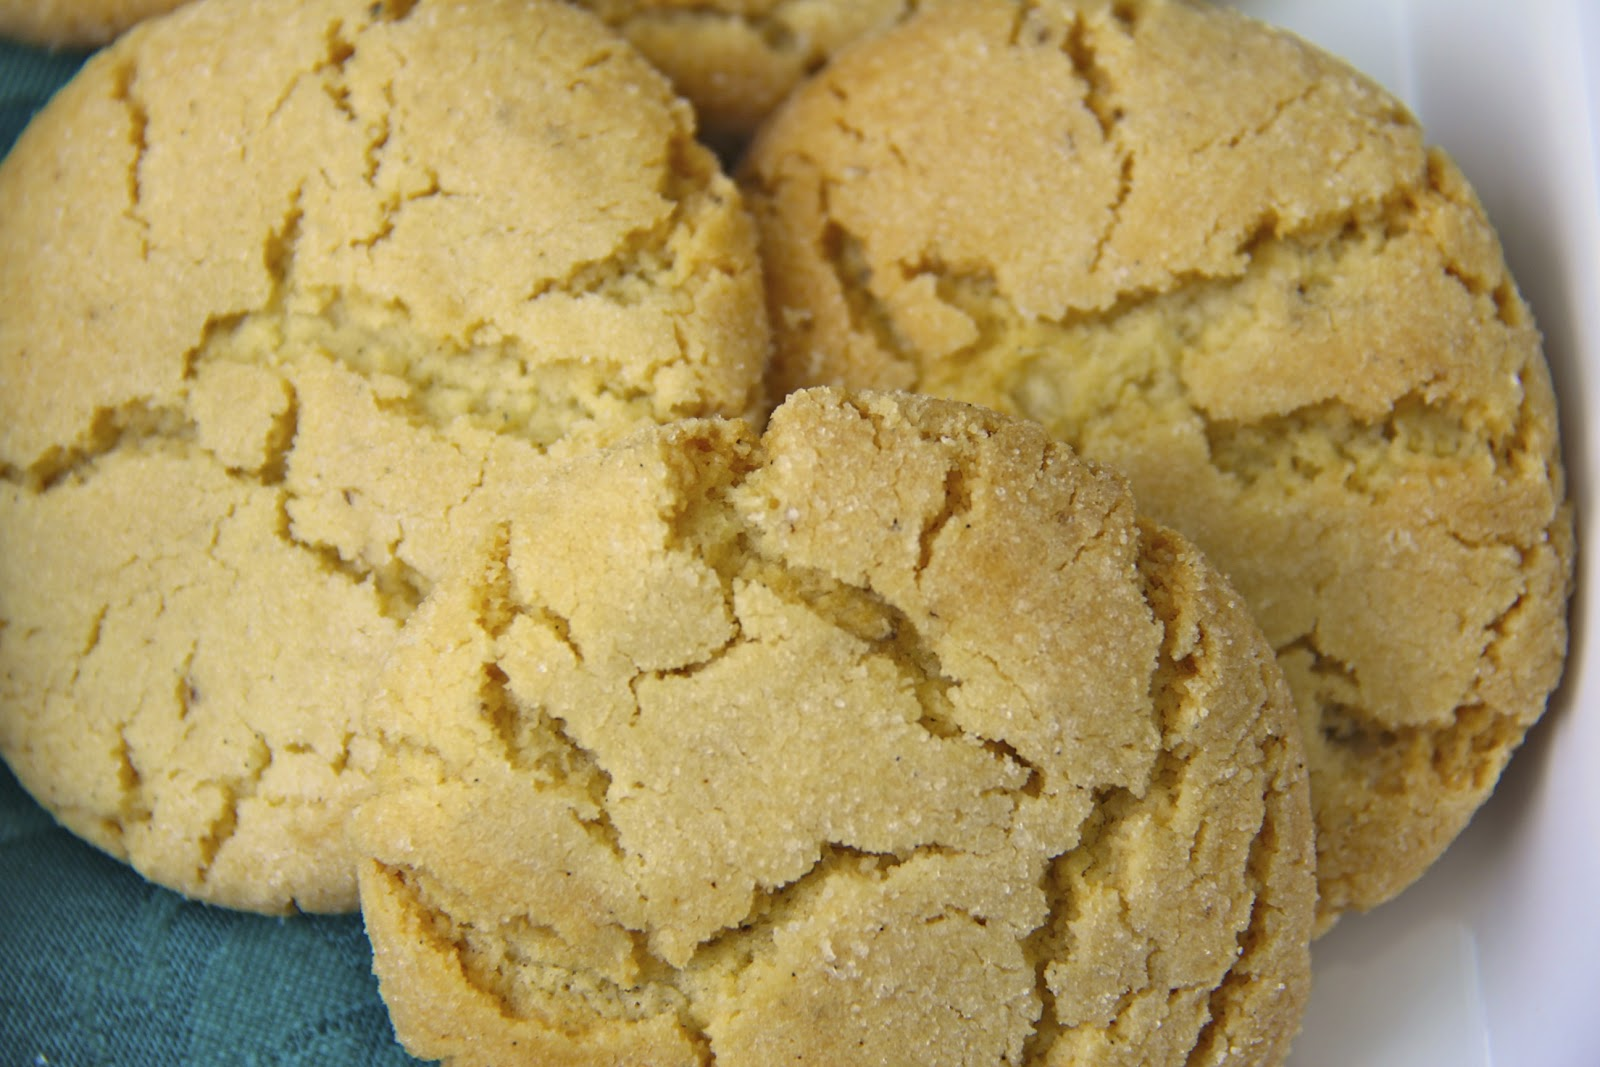 Crinkly, Crackly Vanilla Bean Sugar Cookies | The Café Sucre Farine